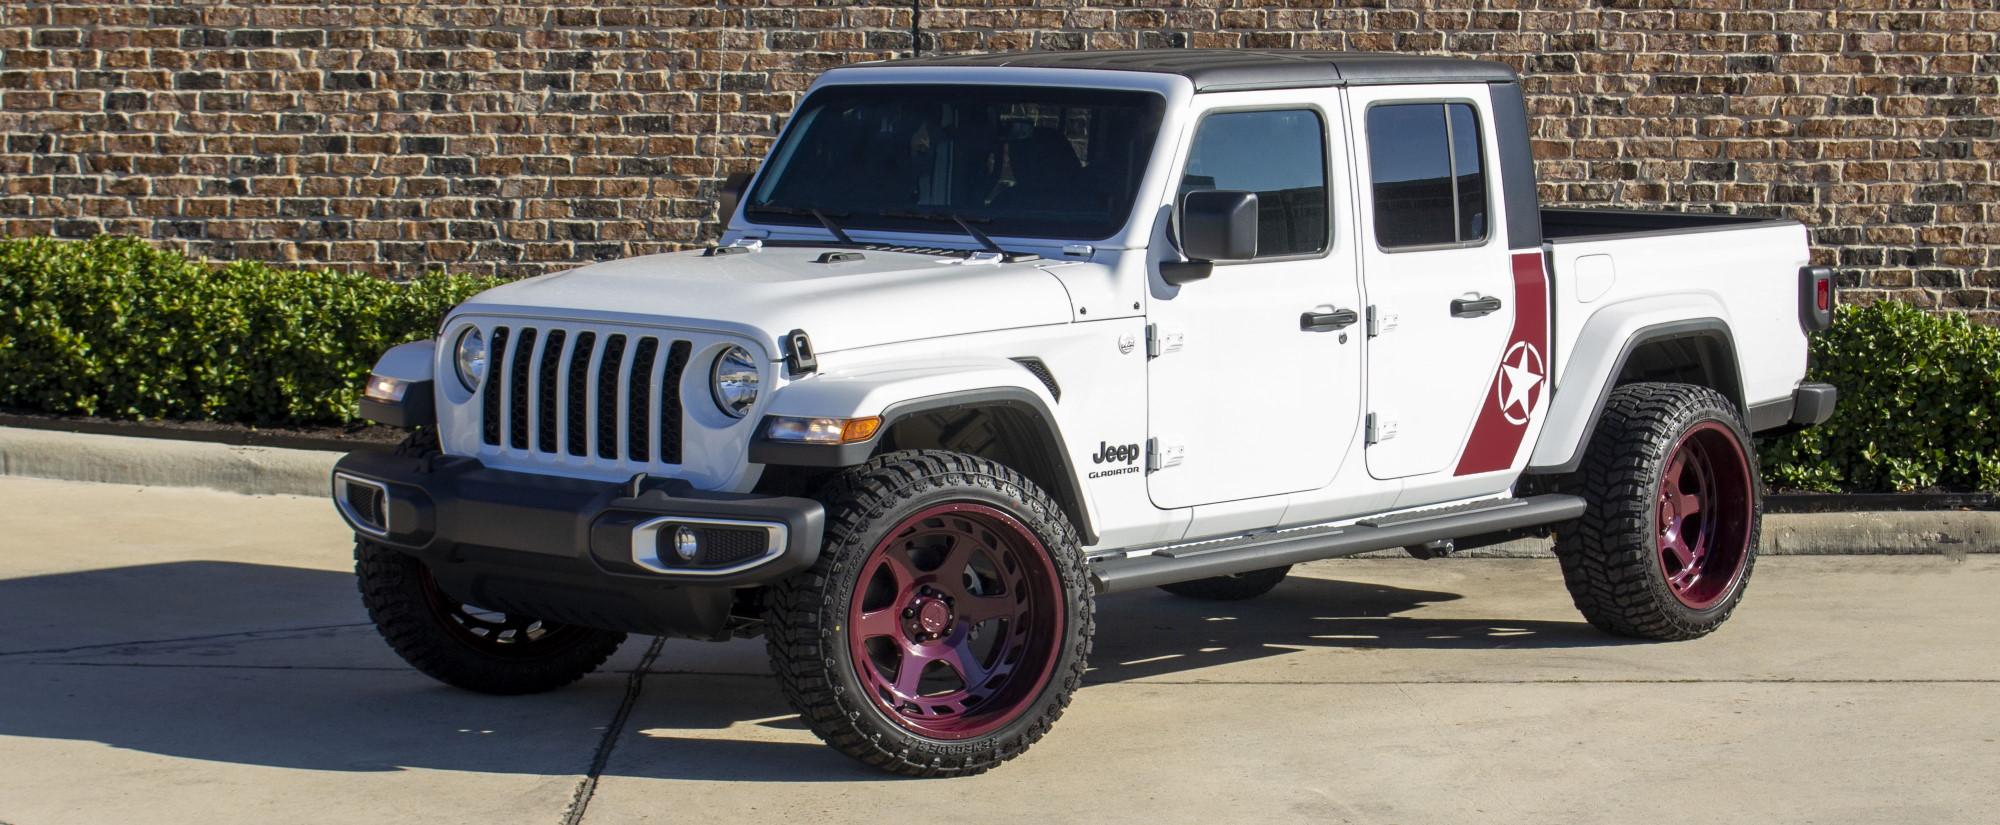 2020 white sport jt gladiator iii build   awt jeep edition